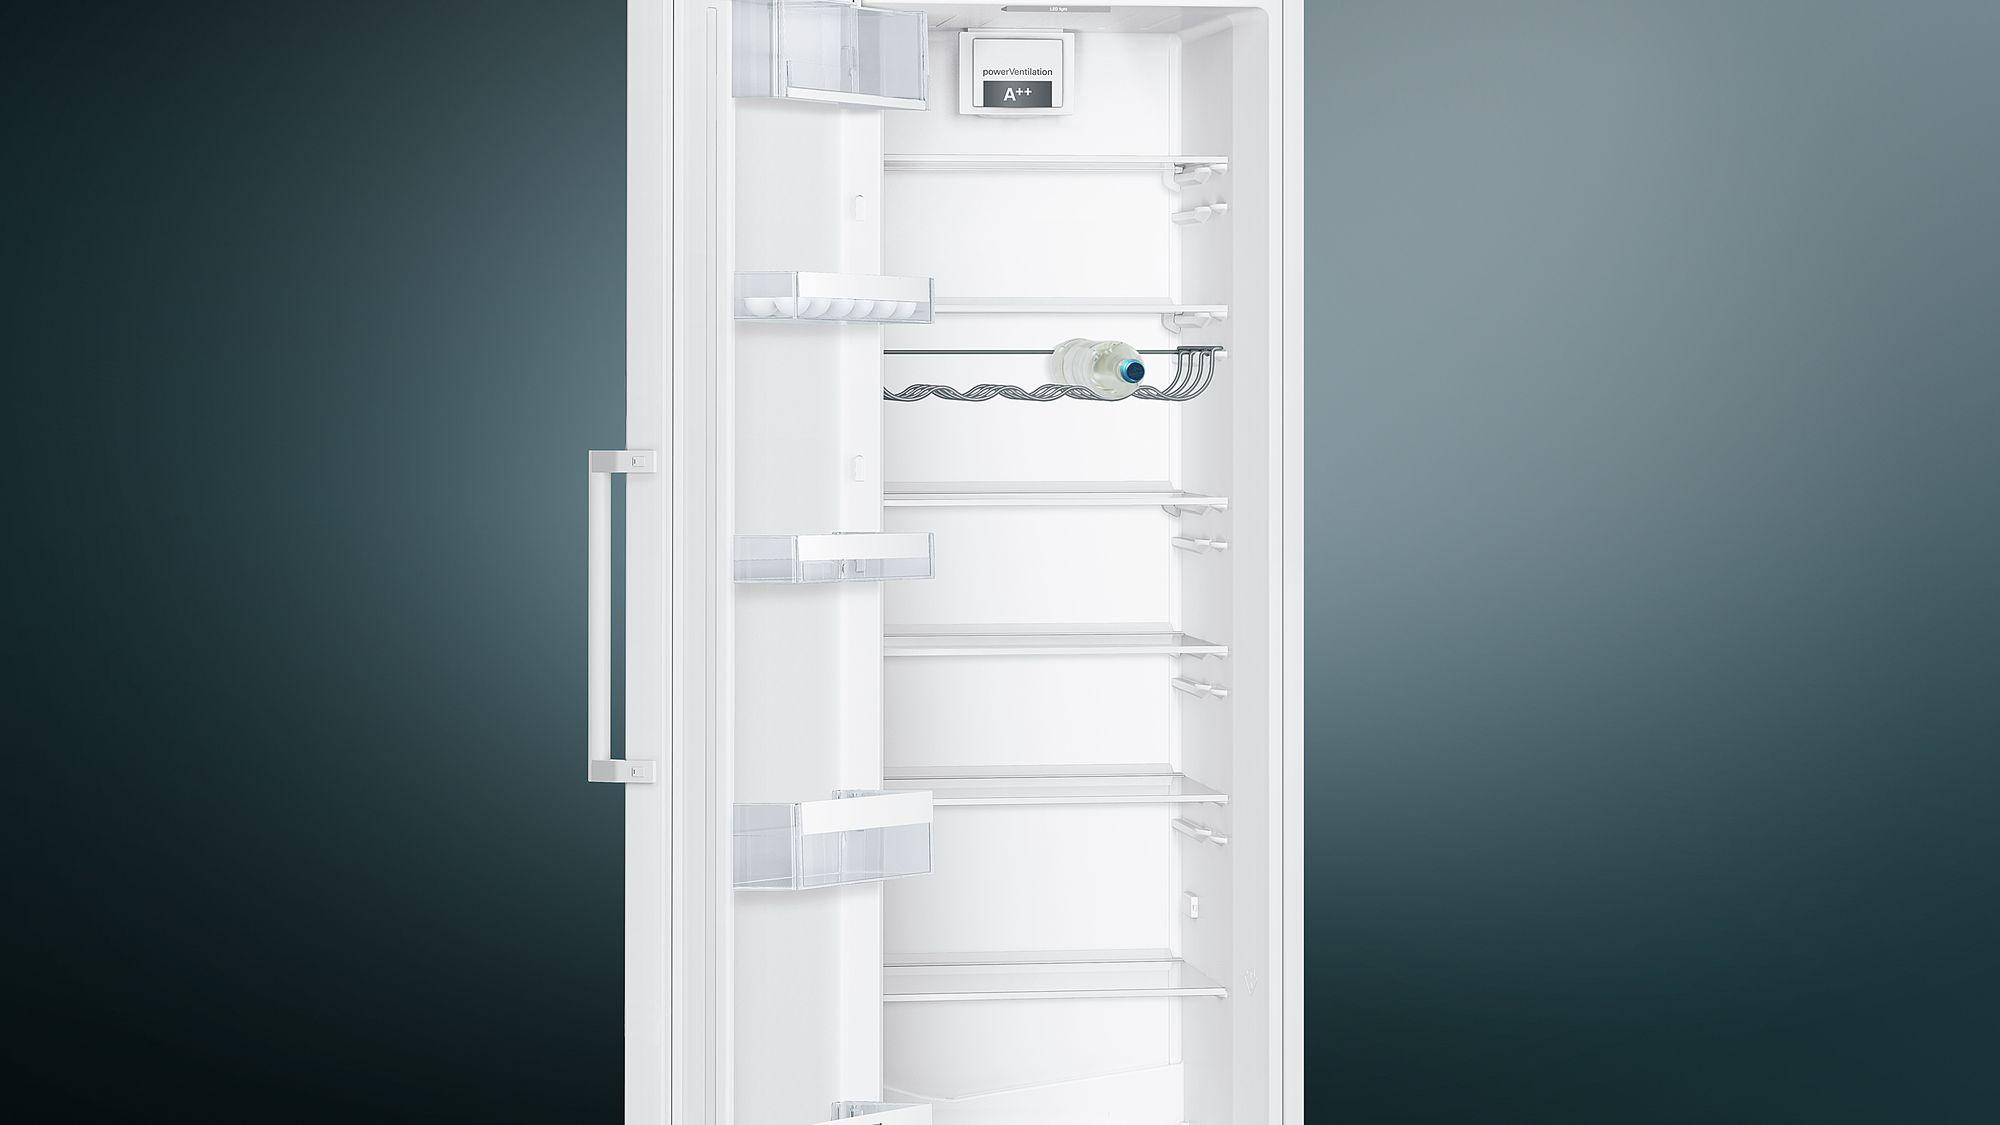 Siemens Kühlschrank Nummer : Siemens stand kühlschrank iq weiß ks vvw p psi